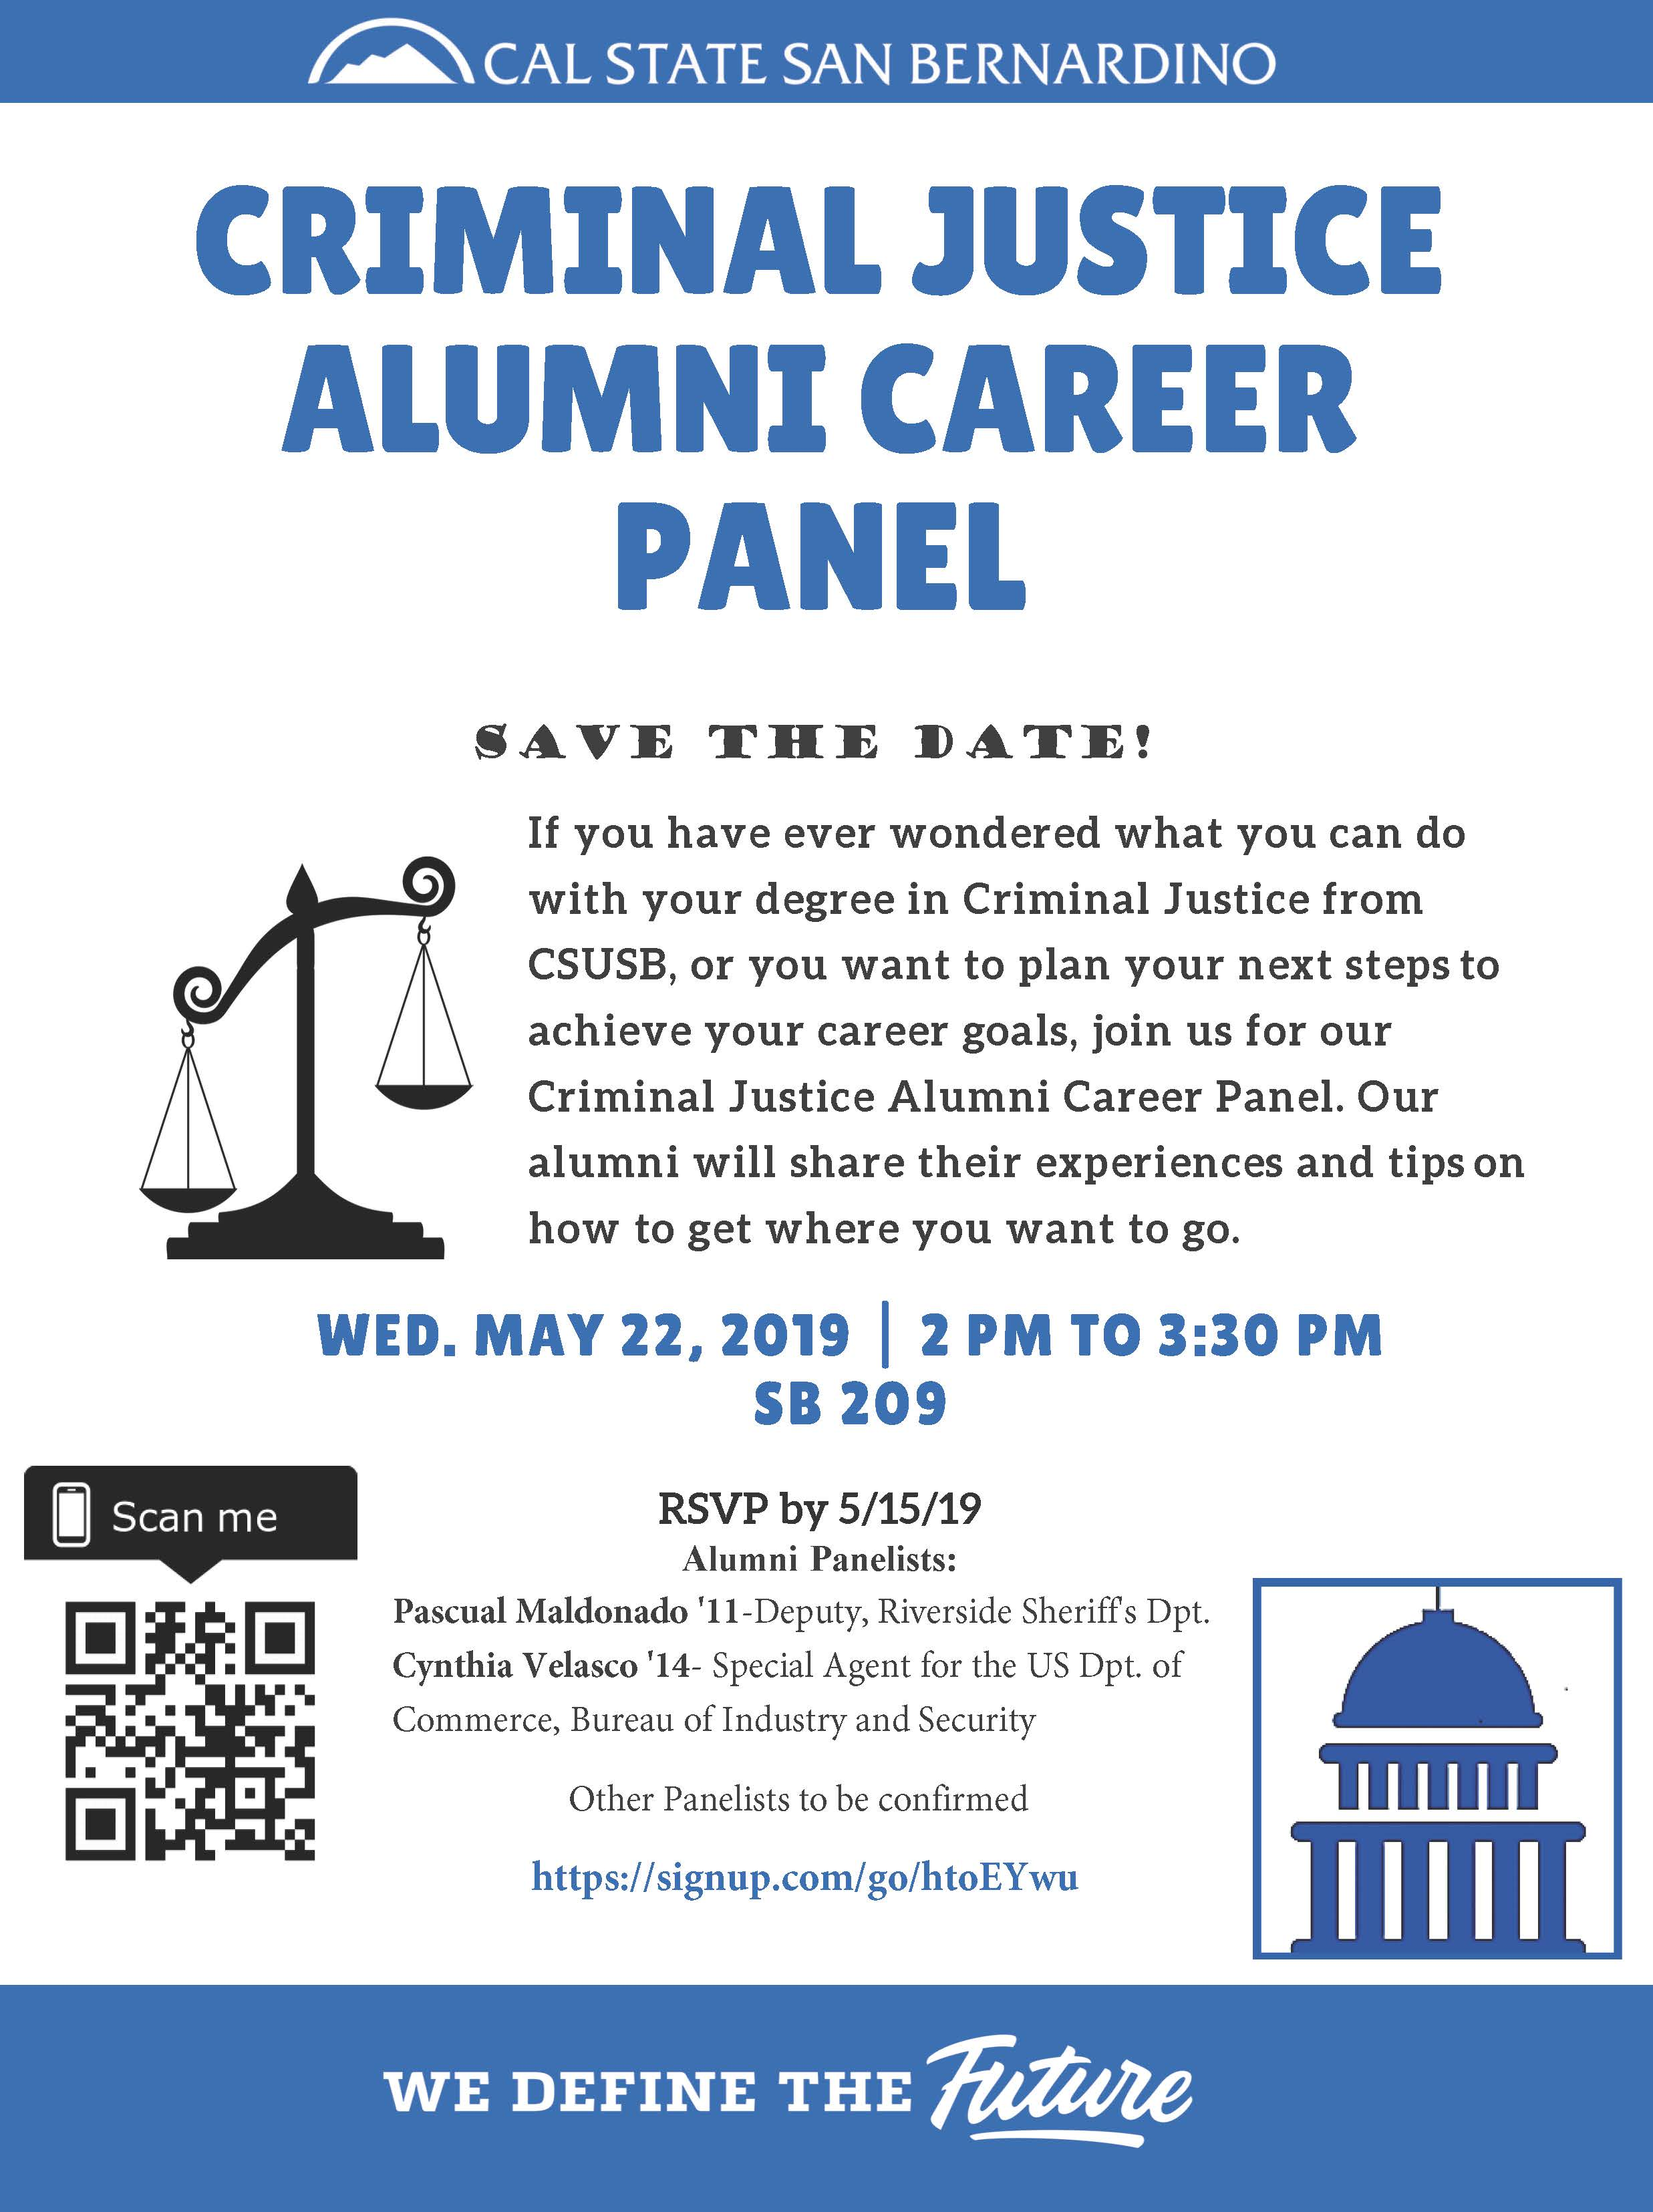 Criminal justice alumni career panel set for May 22